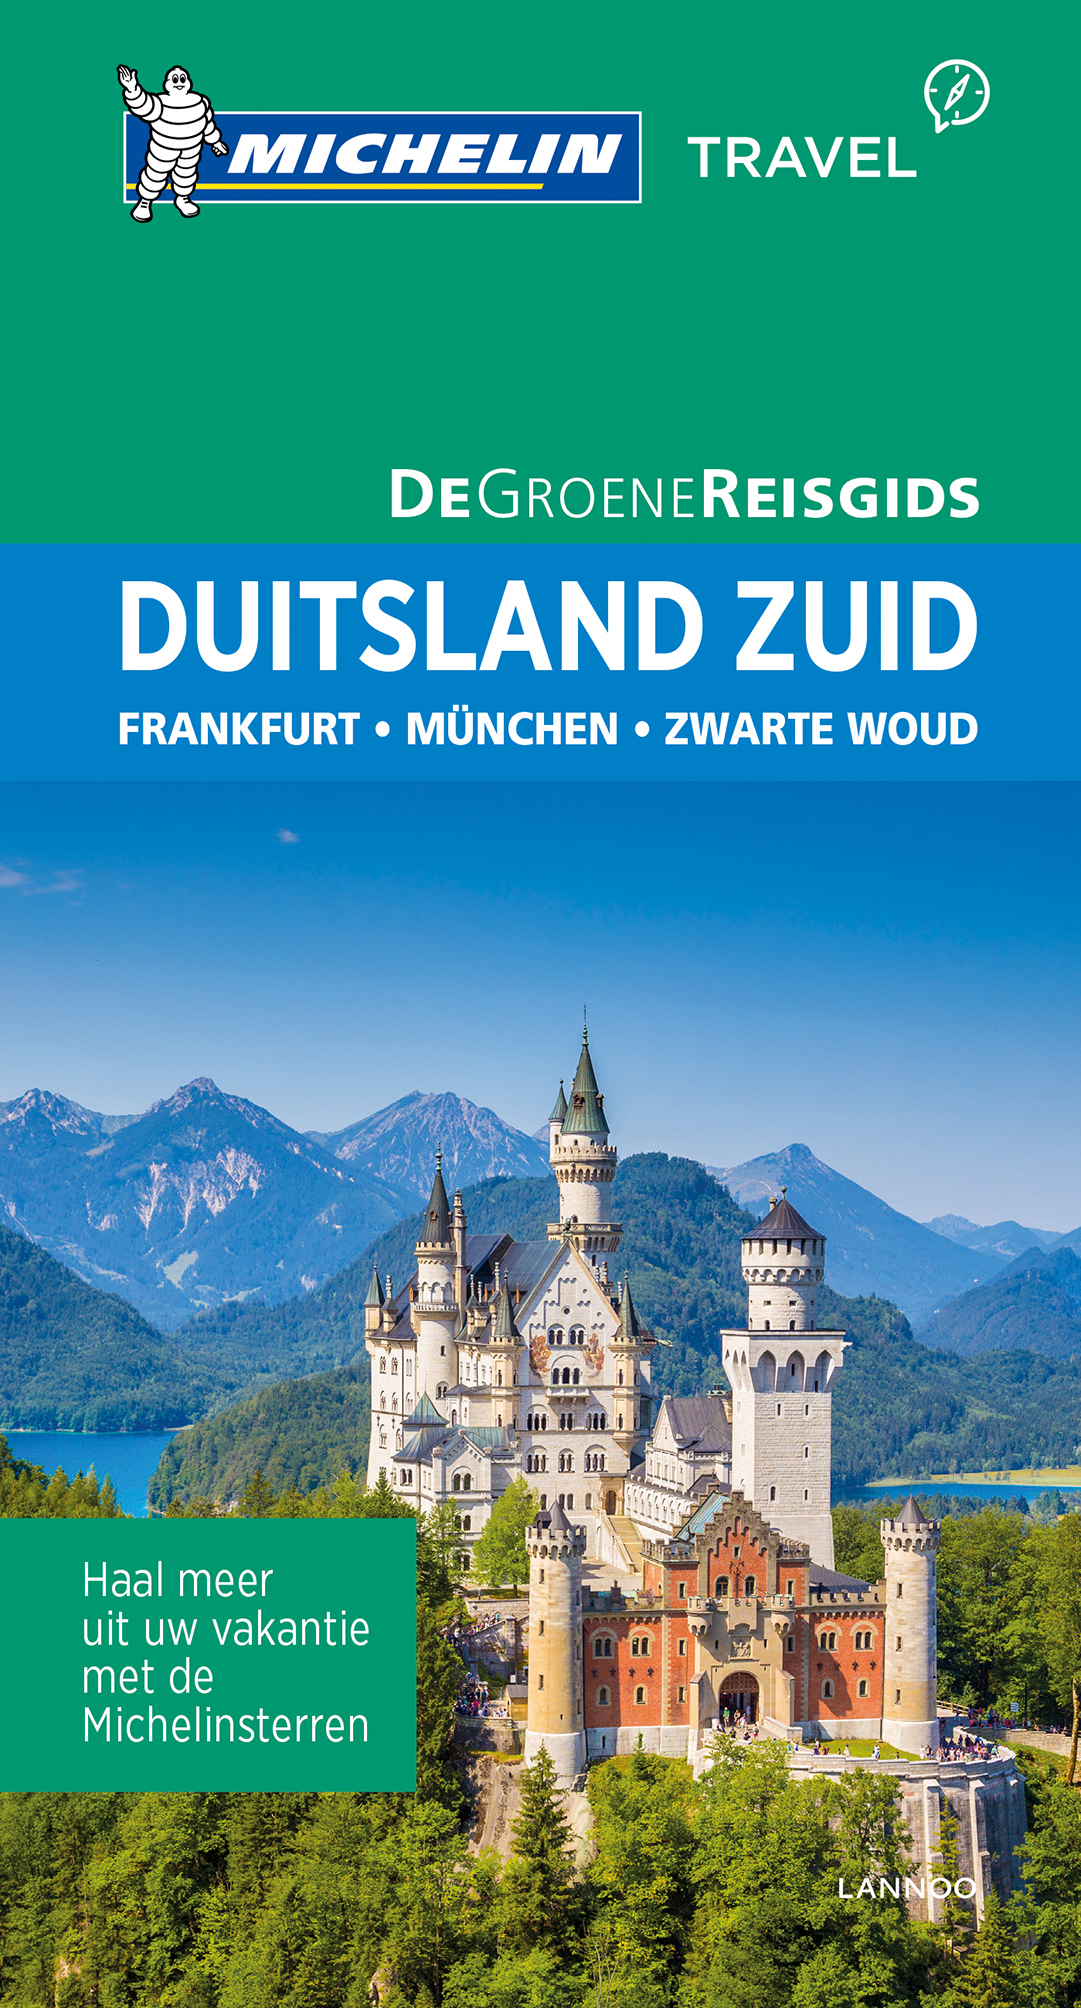 Zuid-Duitsland | Michelin reisgids 9789401439596  Michelin Michelin Groene gidsen  Reisgidsen Zuid-Duitsland